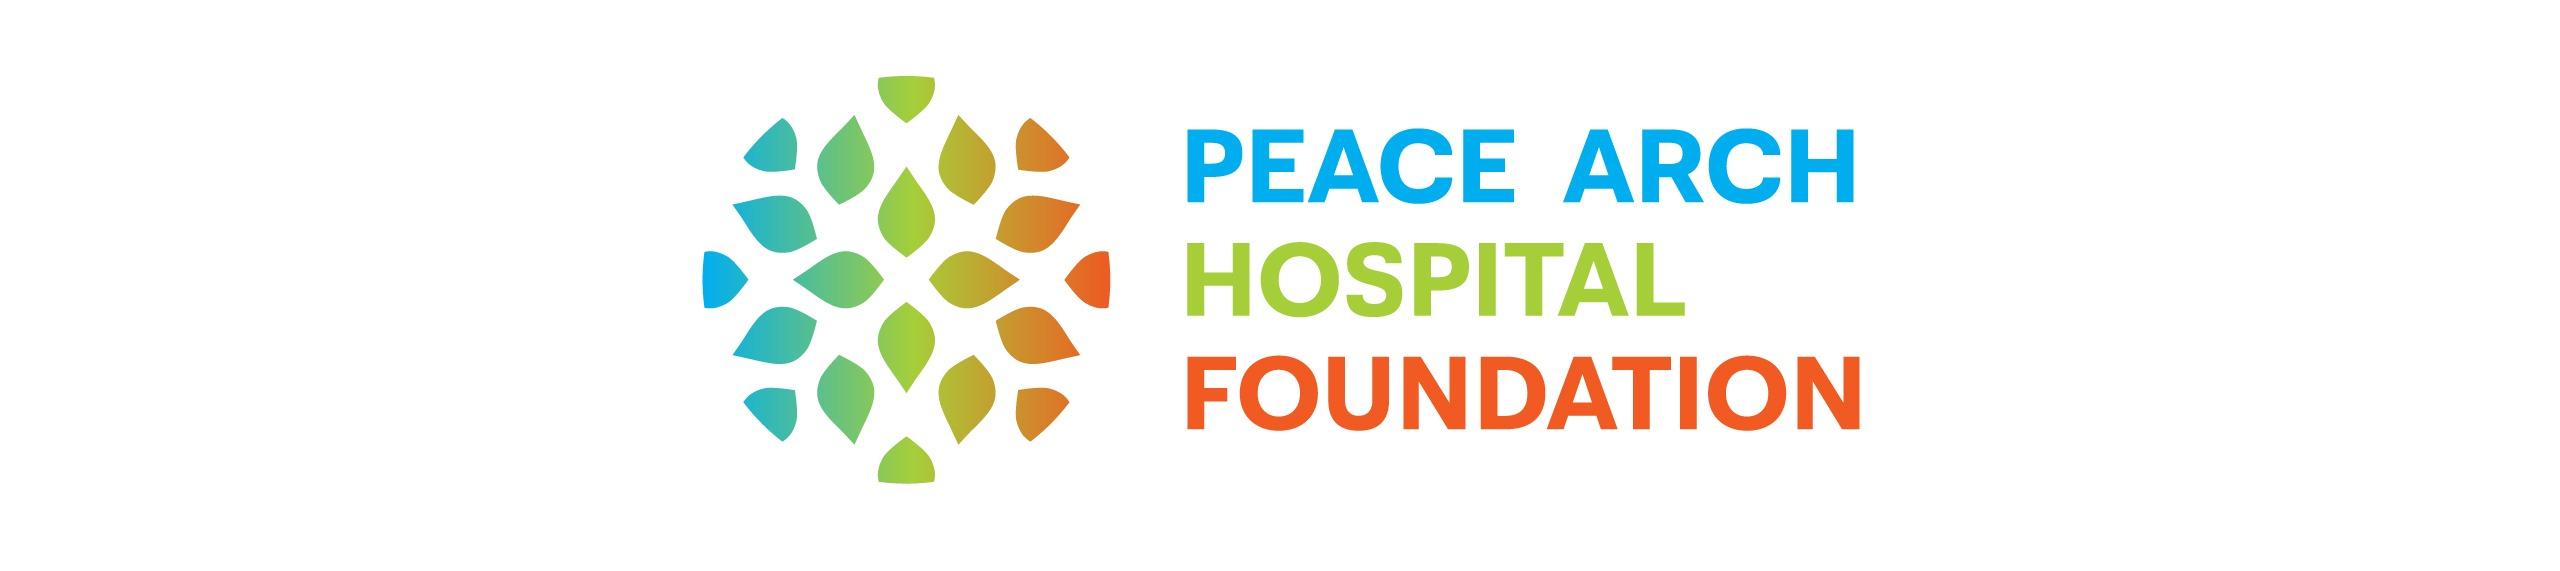 pah-rebrand-logo